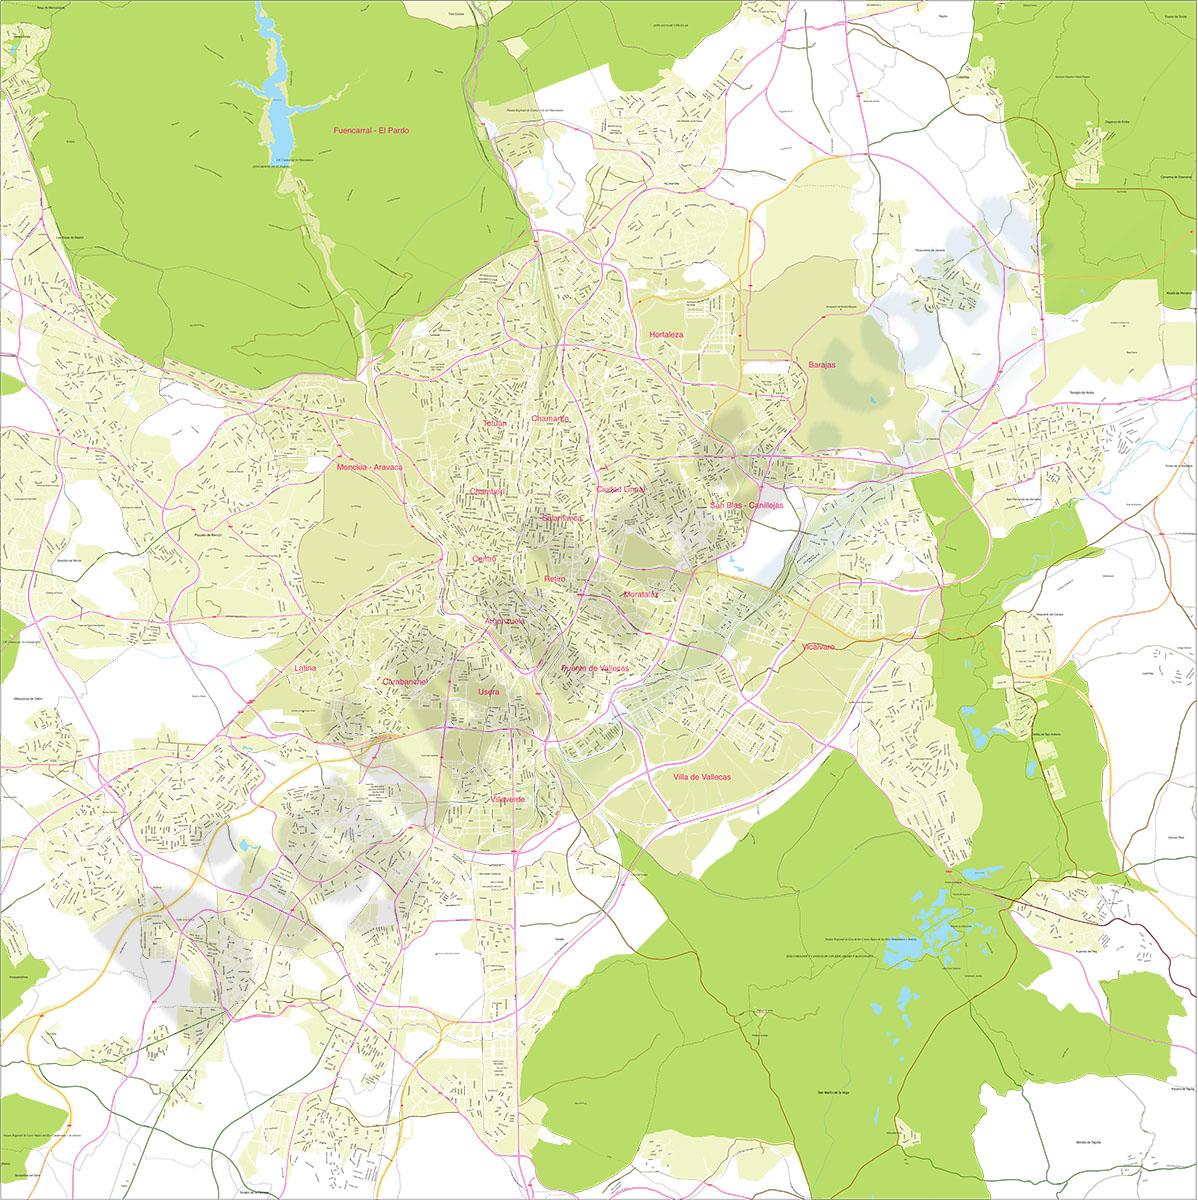 Mapa del Área Metropolitana de Madrid